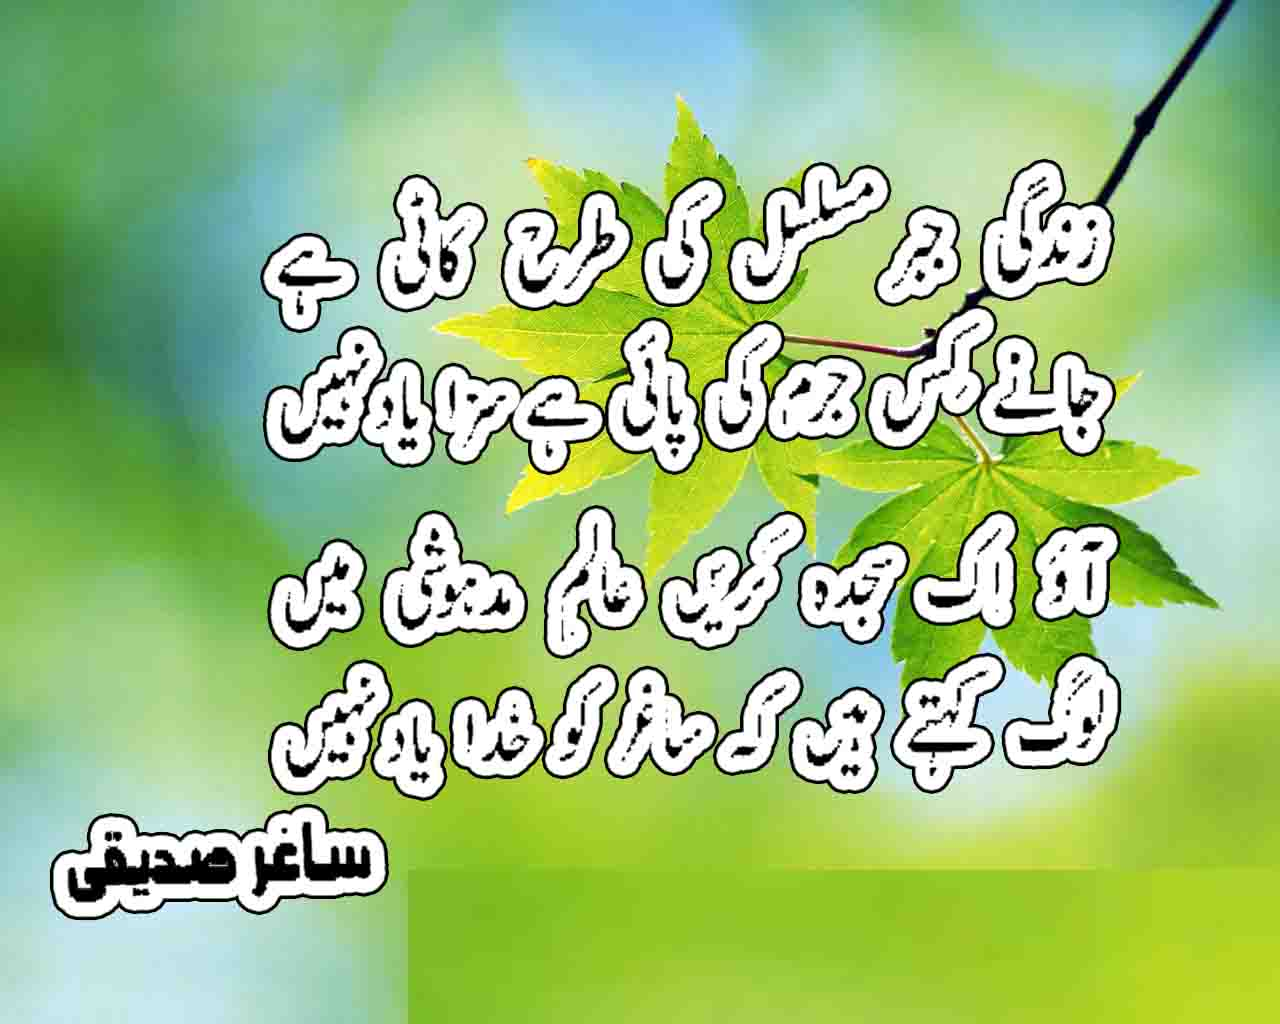 Friendship Quotes Urdu English Quote Urdu Love Poetry